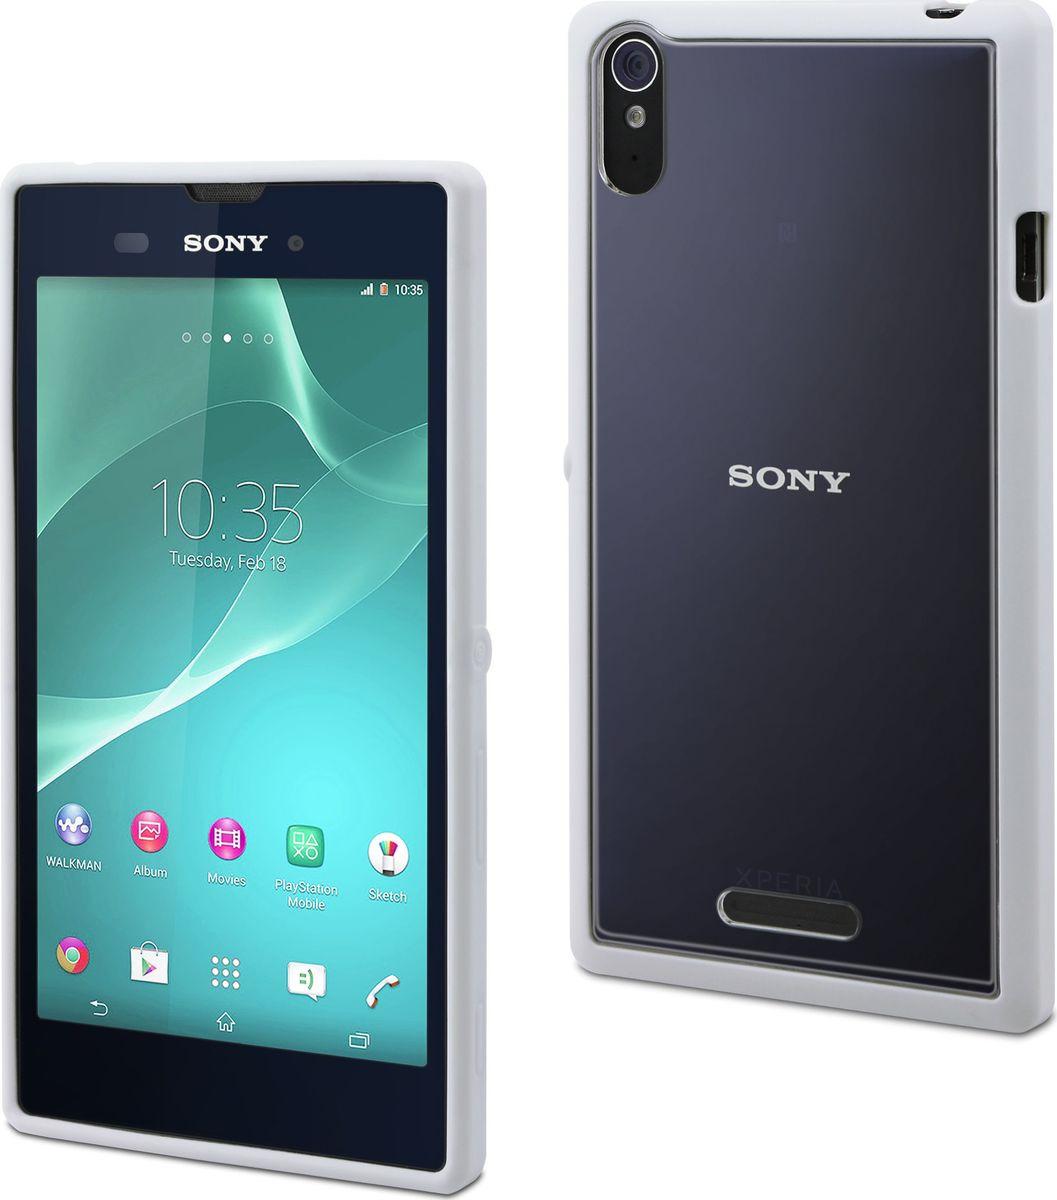 Чехол для сотового телефона Muvit MFX Bimat Case для Sony Xperia T3, SEBMC0034, белый